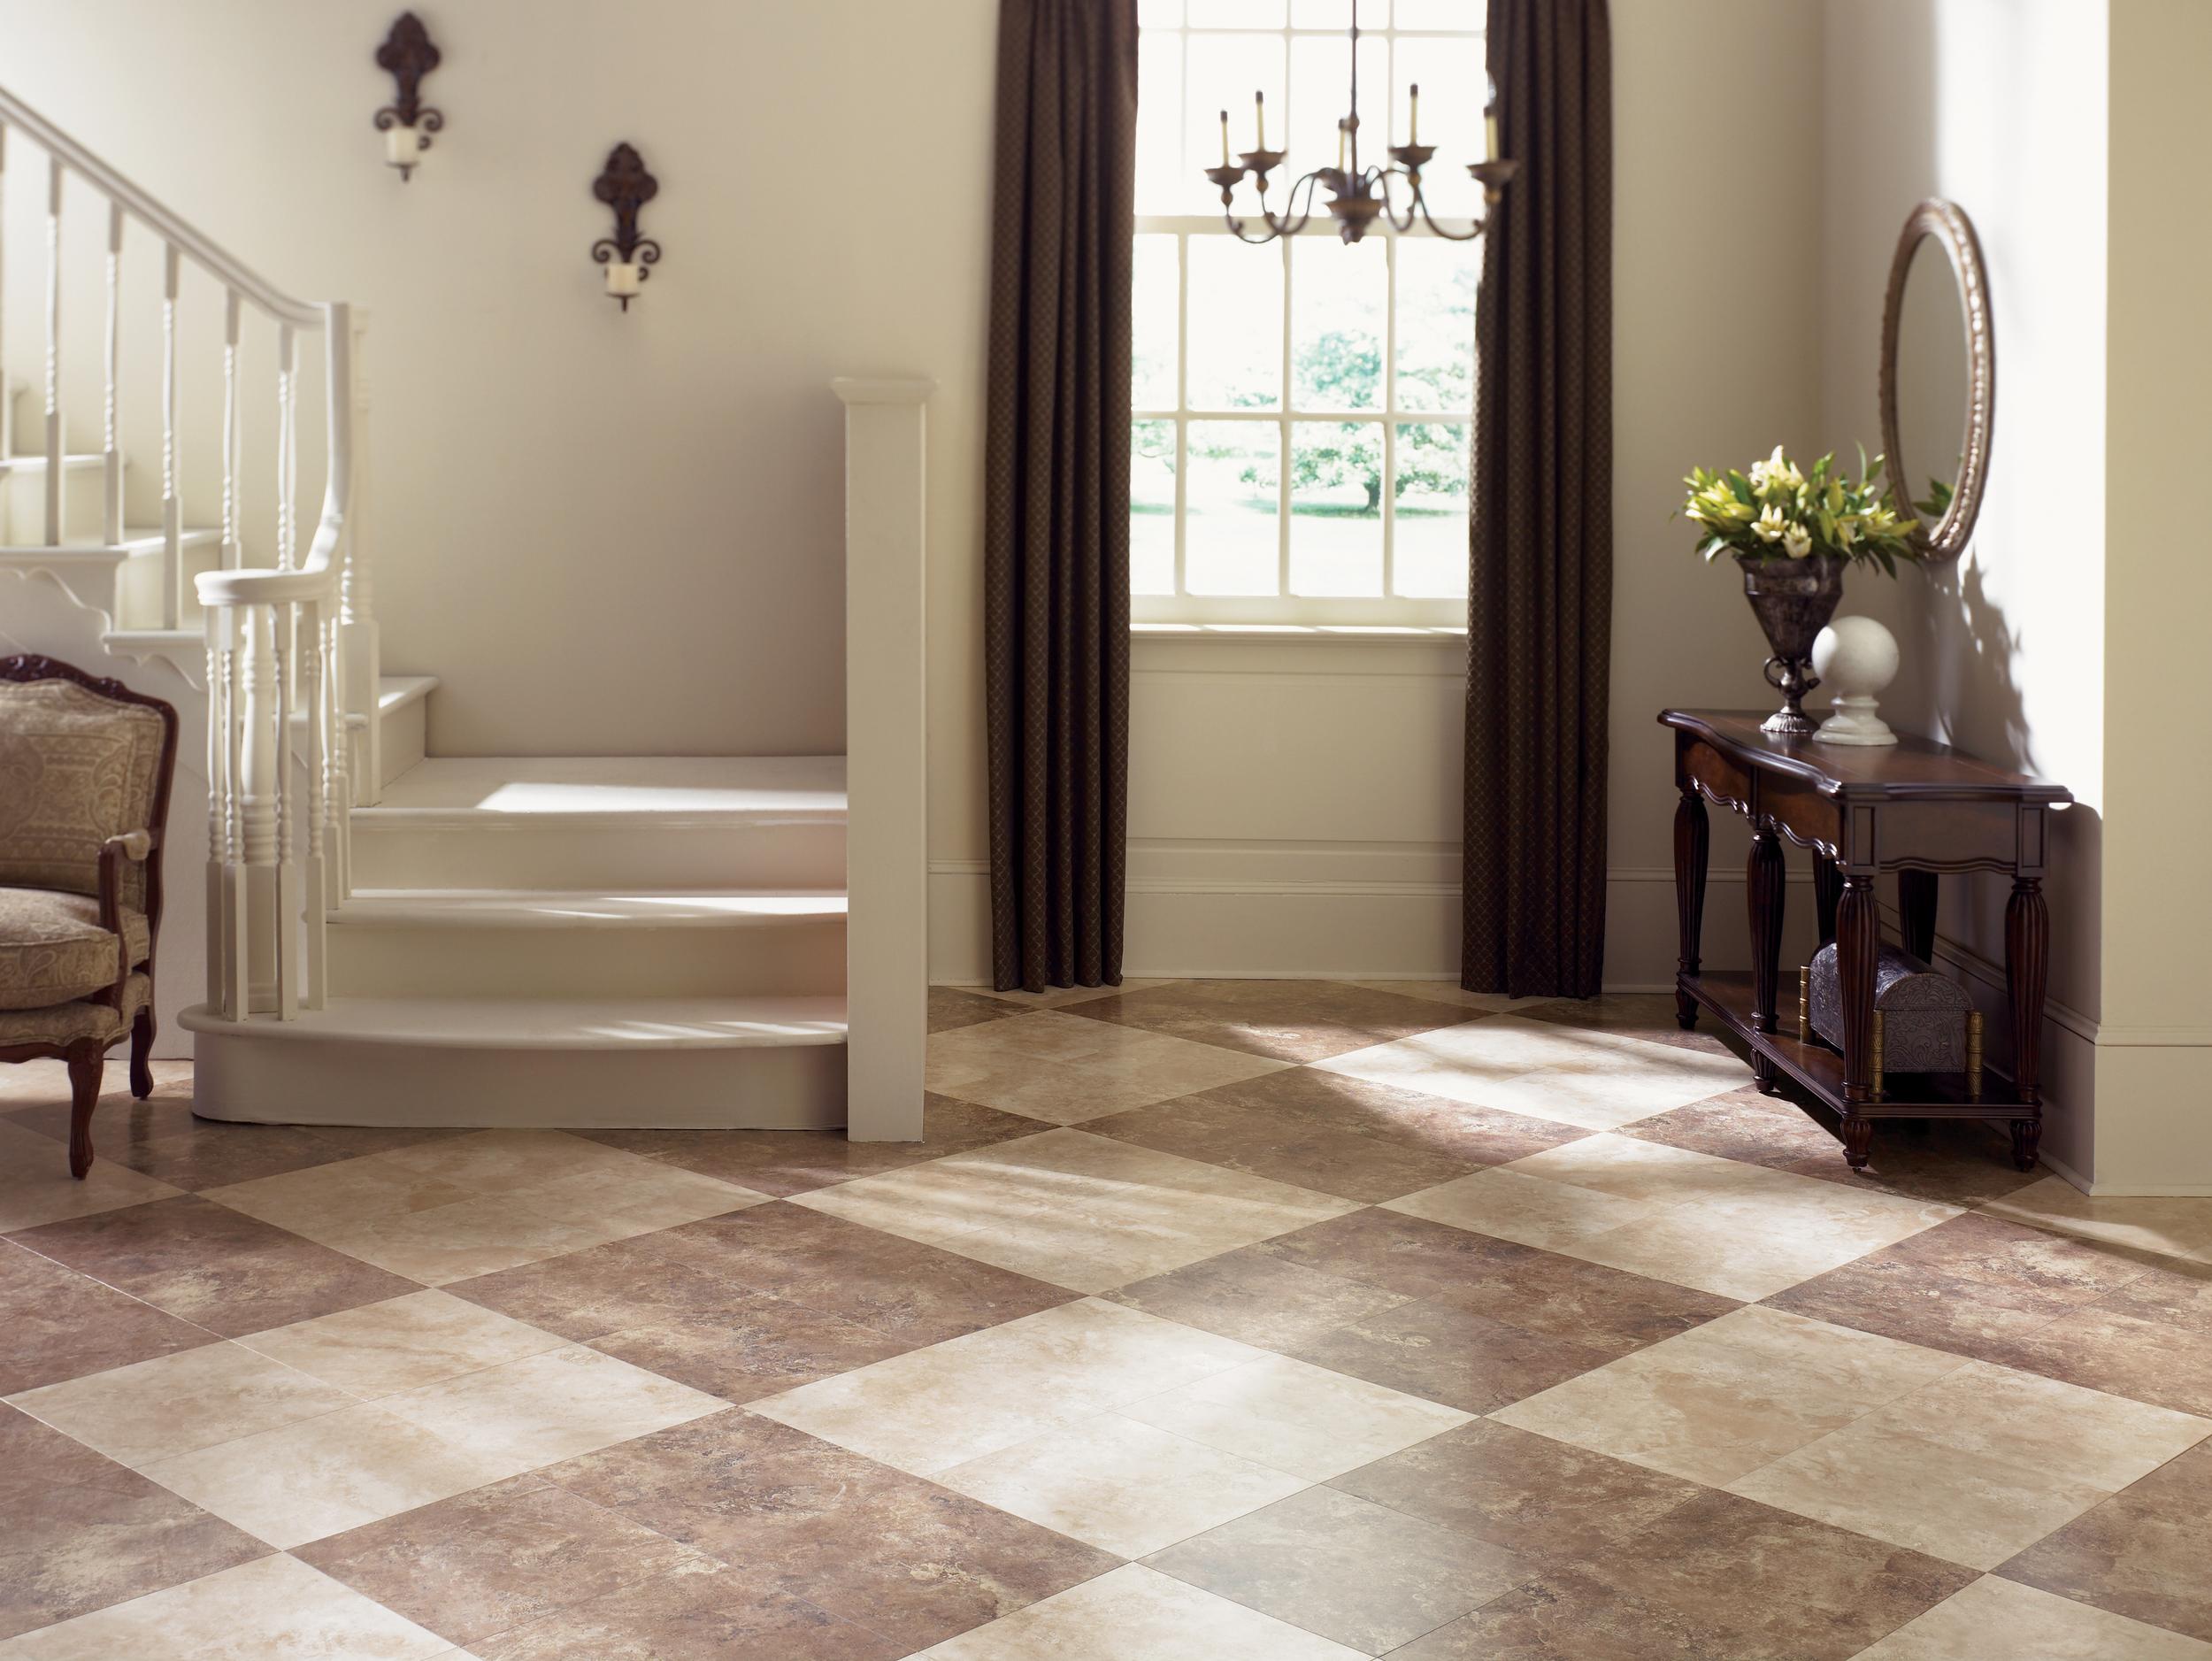 12 x 12 tile design